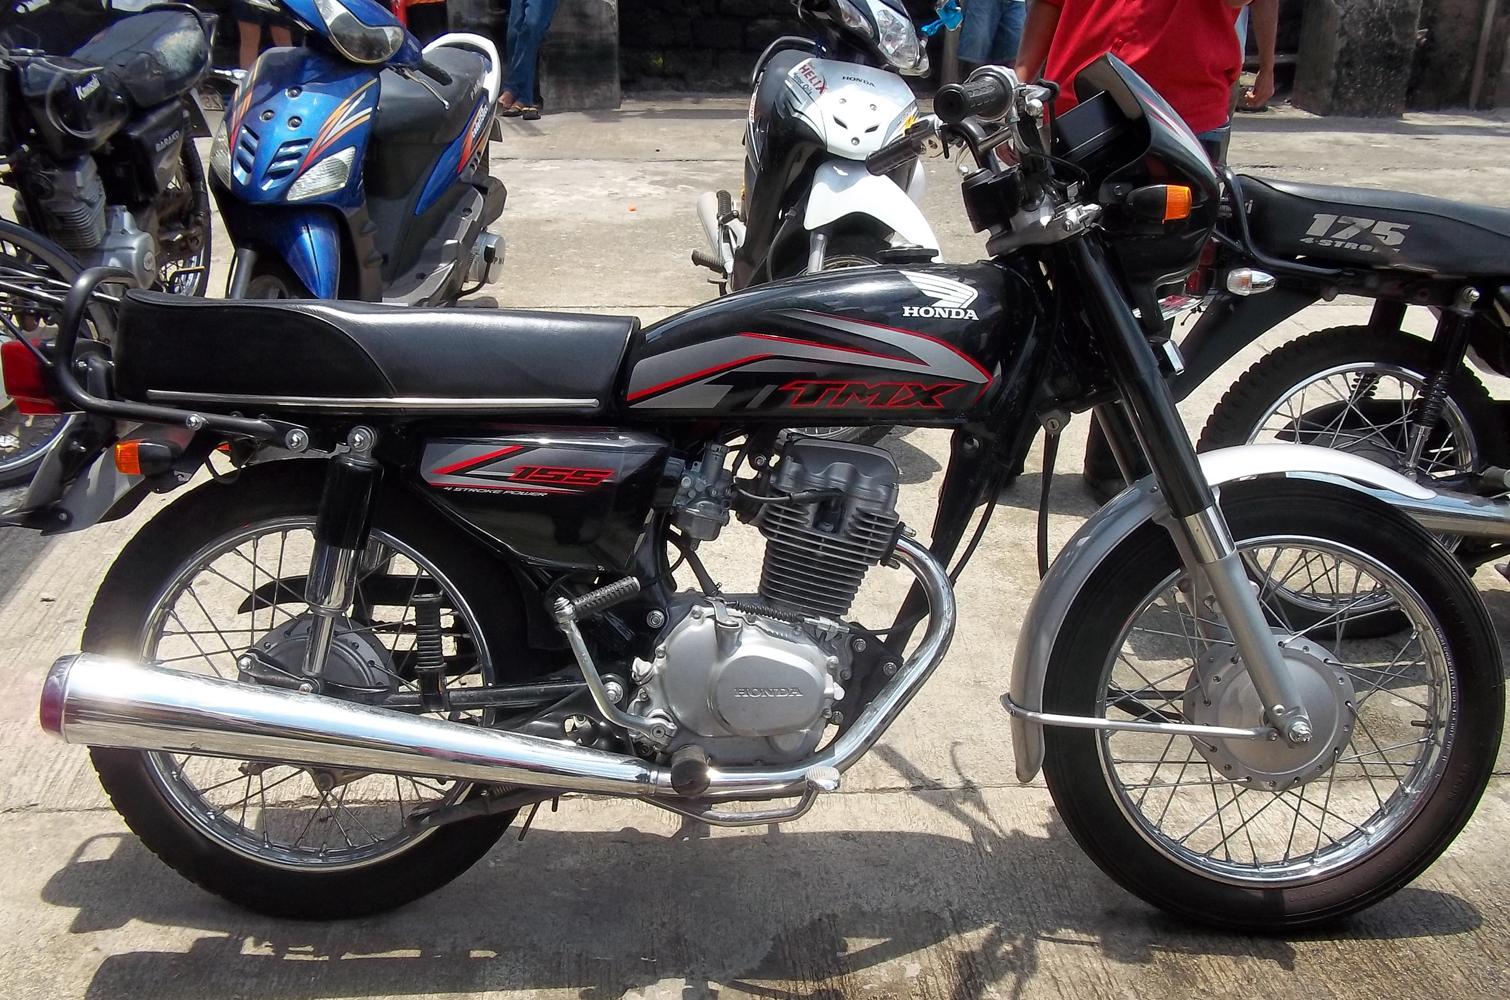 Honda Tmx 155  P55 000 On Cash And Installment Basis